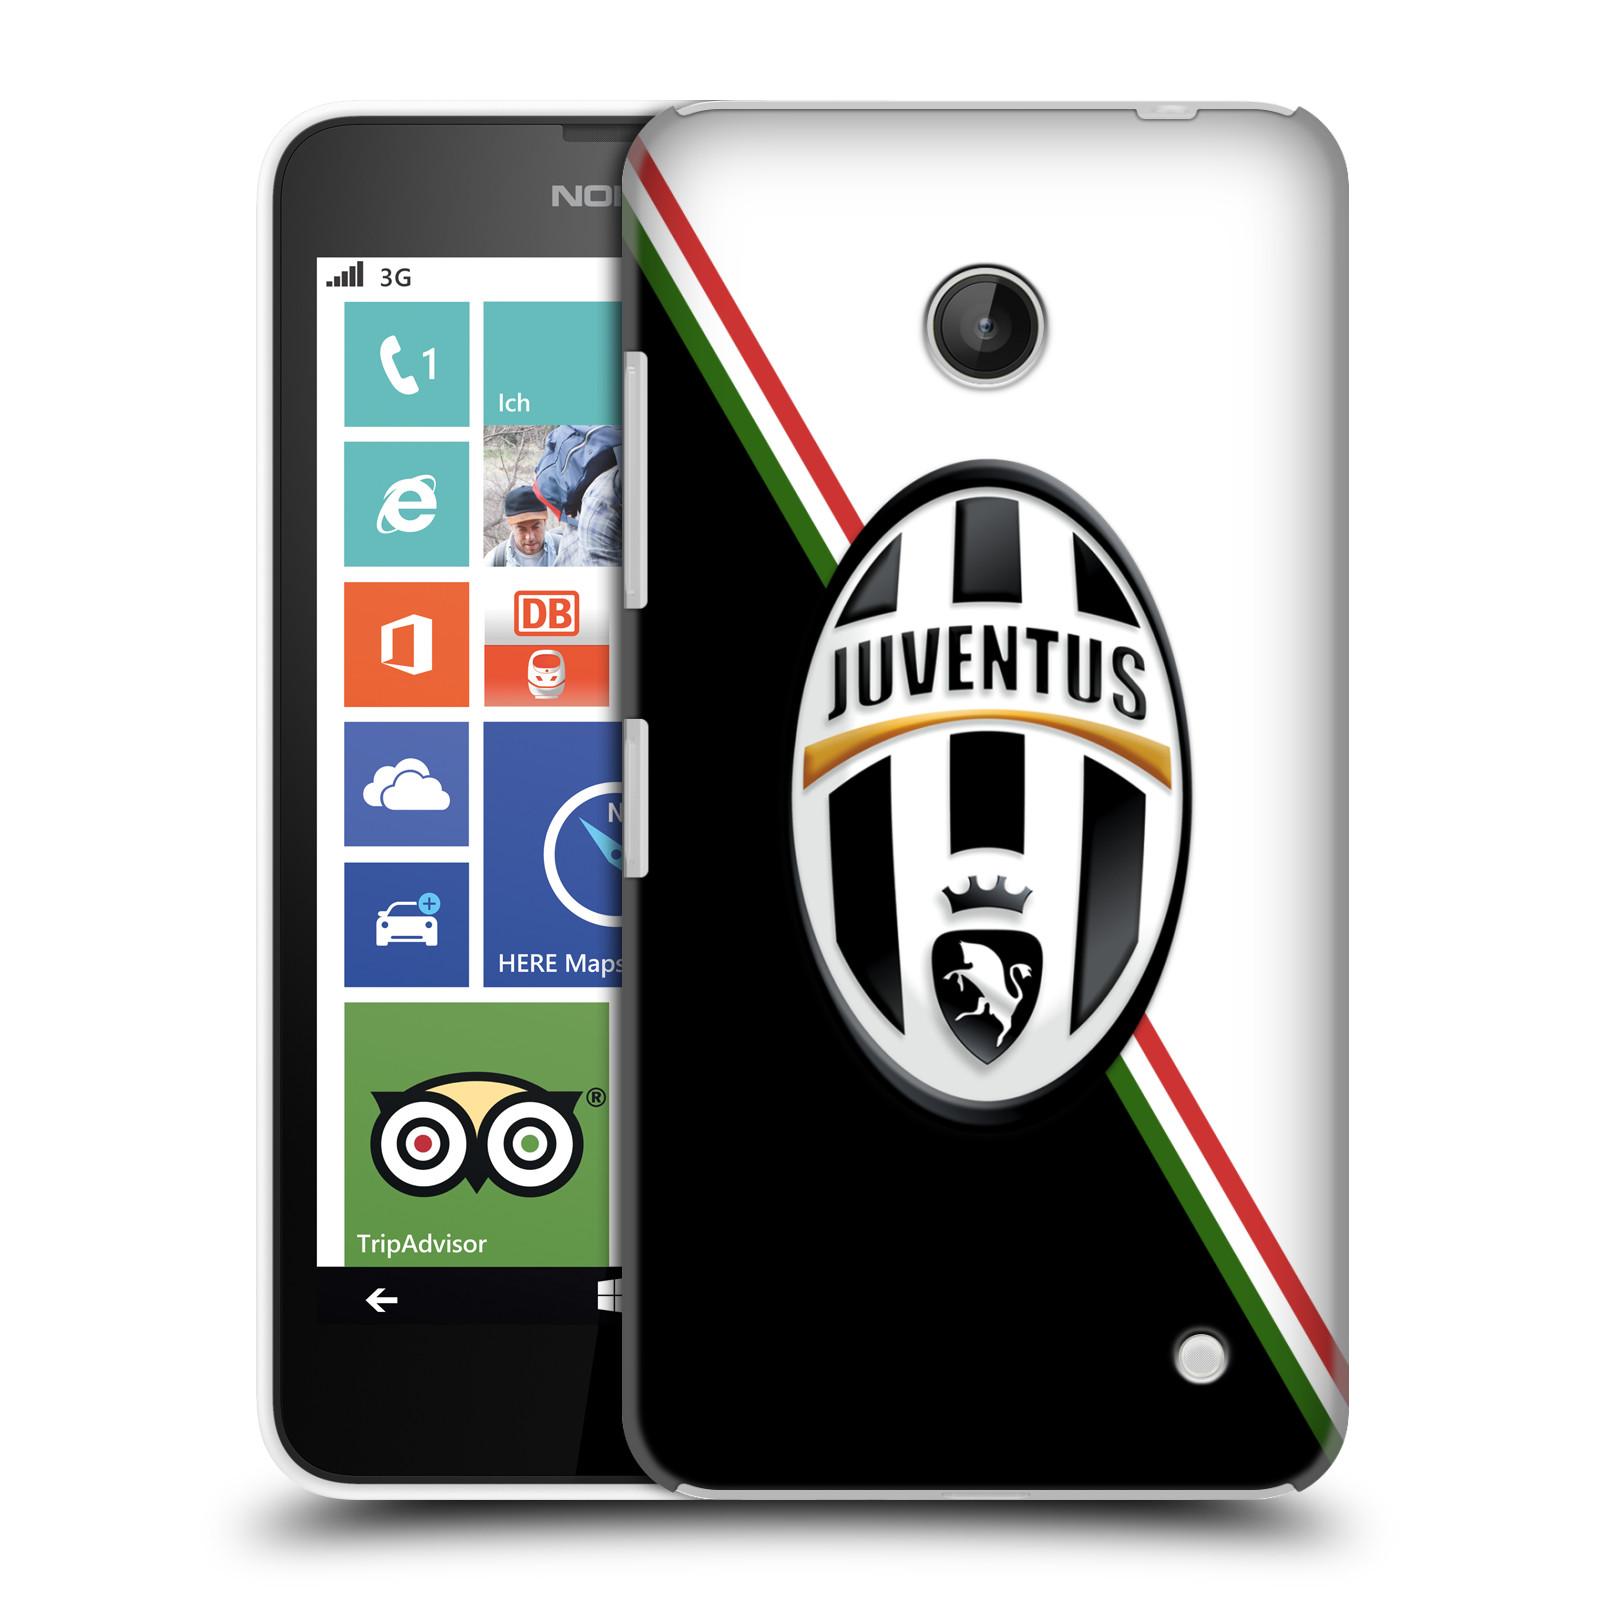 Plastové pouzdro na mobil Nokia Lumia 630 HEAD CASE Juventus FC - Black and White (Plastový kryt či obal na mobilní telefon Juventus FC Official pro Nokia Lumia 630 a Nokia Lumia 630 Dual SIM)